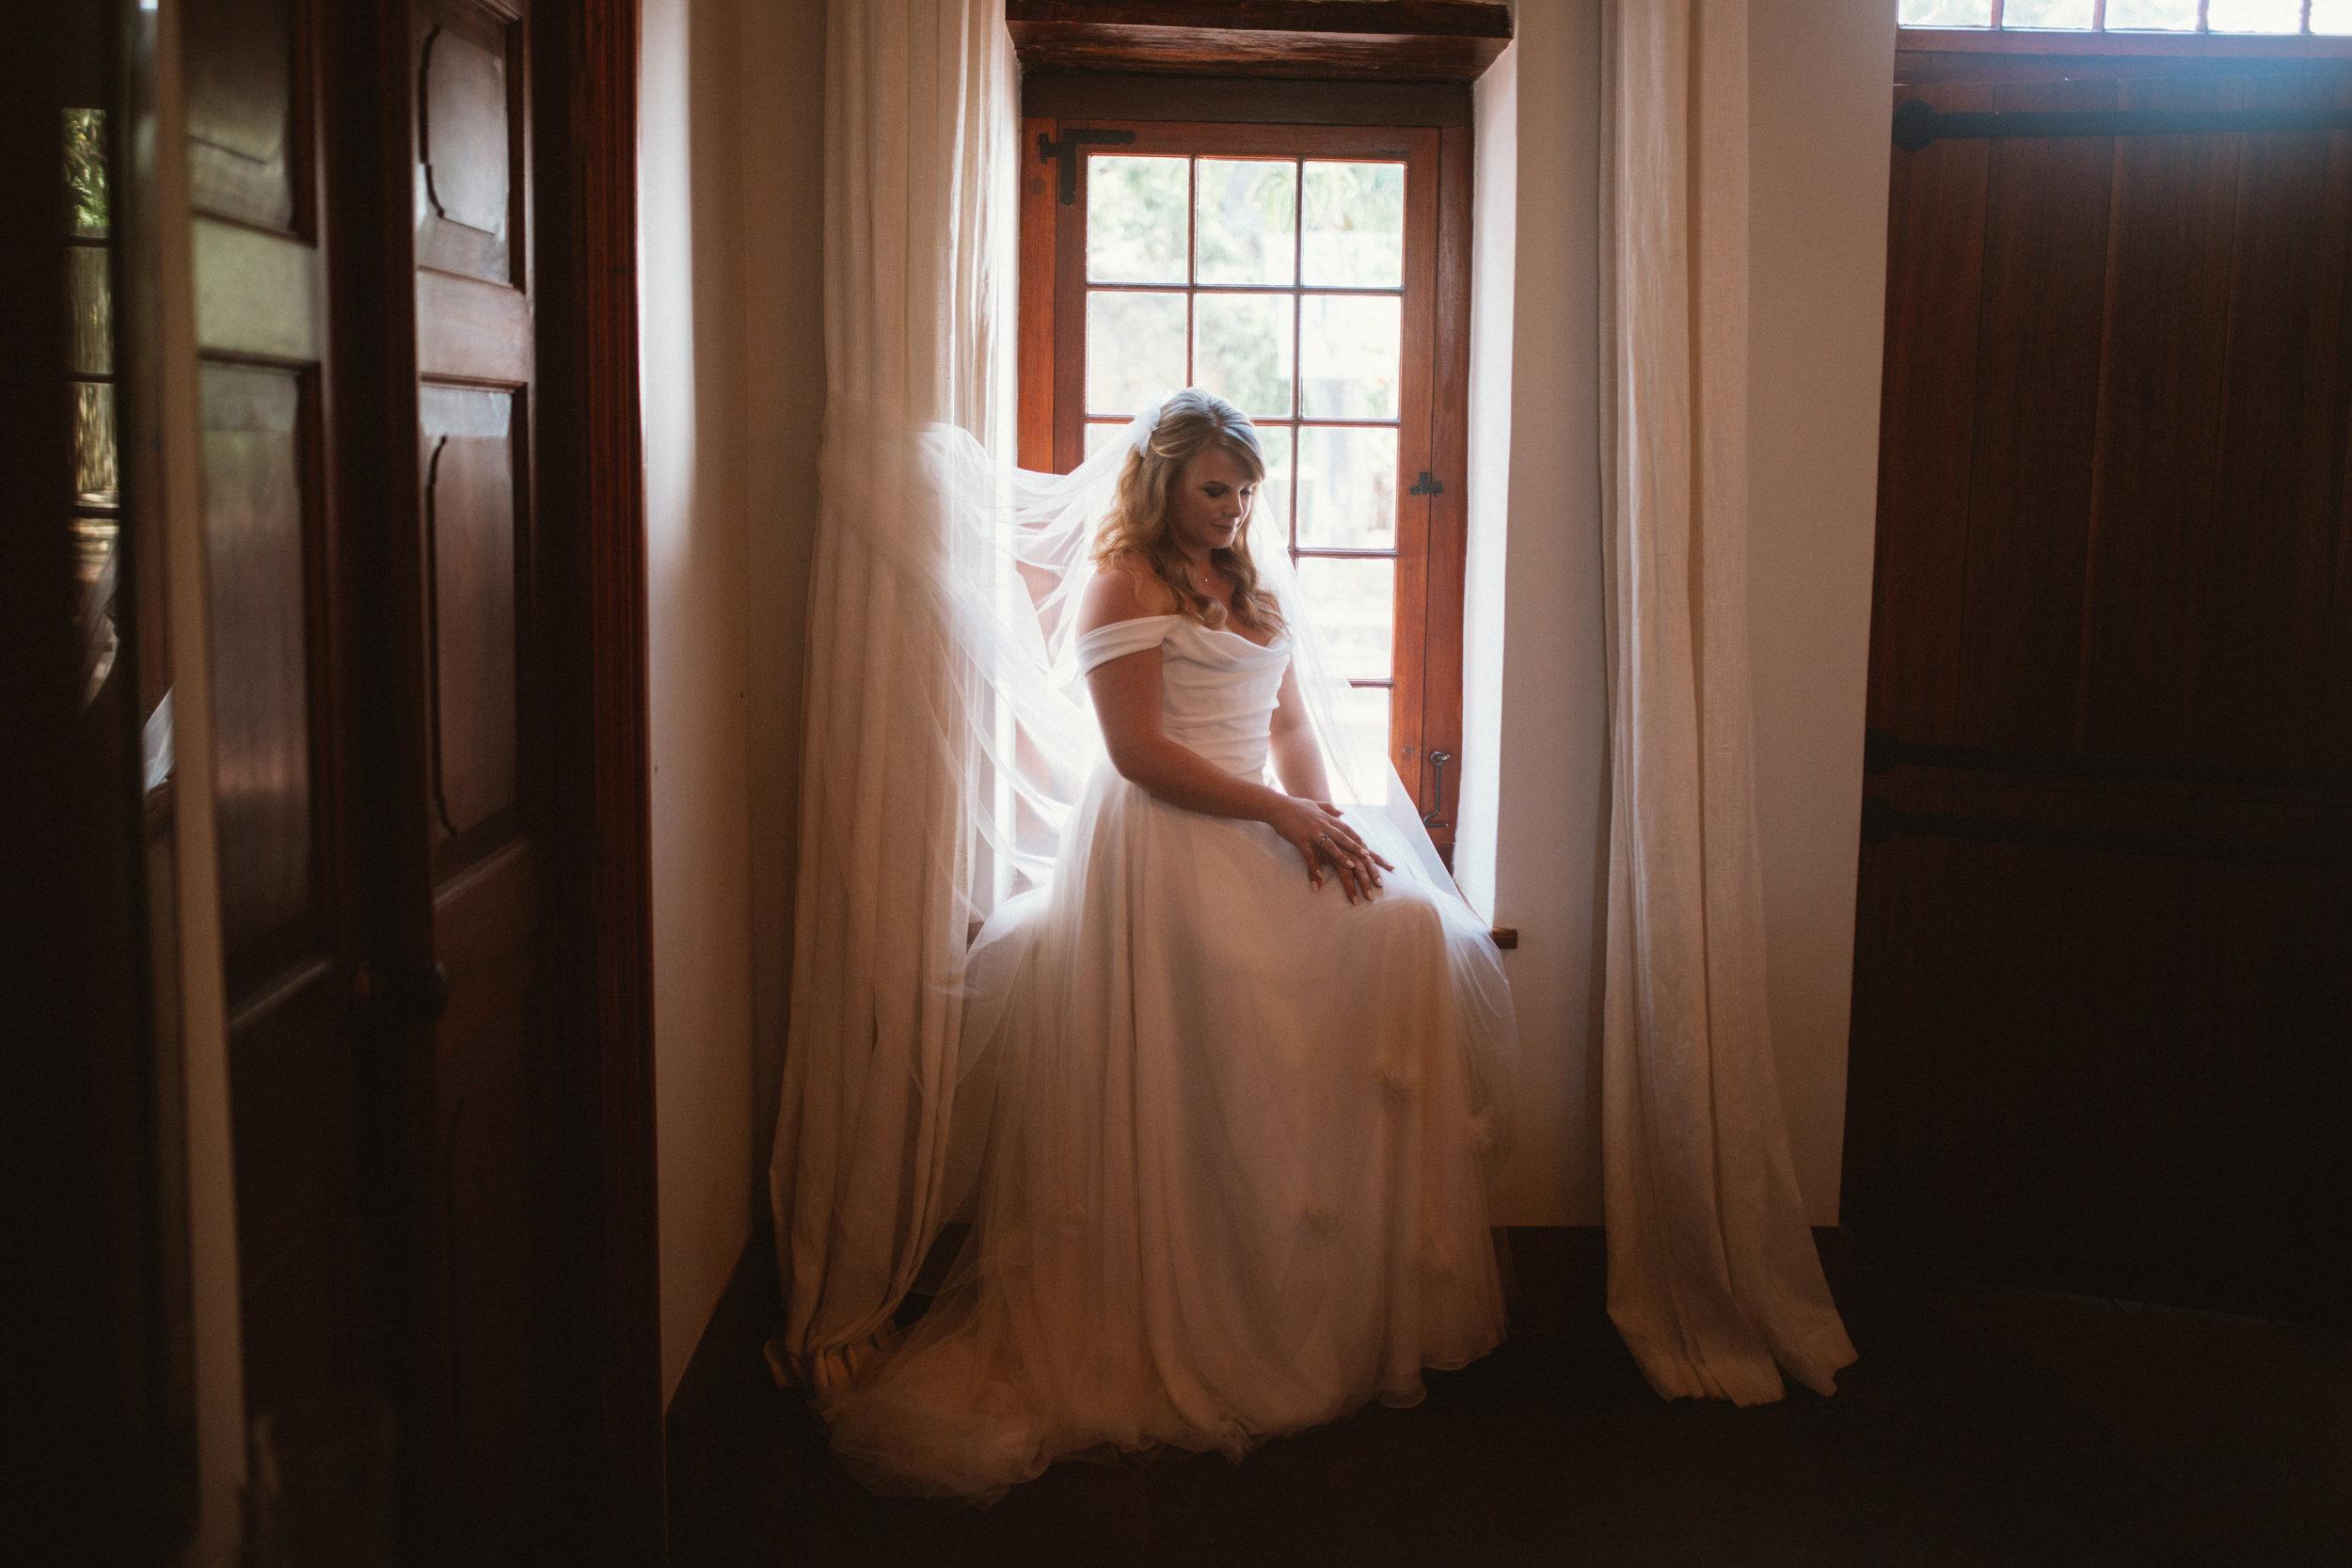 Beautiful bride Lizzie wore a wedding dress by Halfpenny London